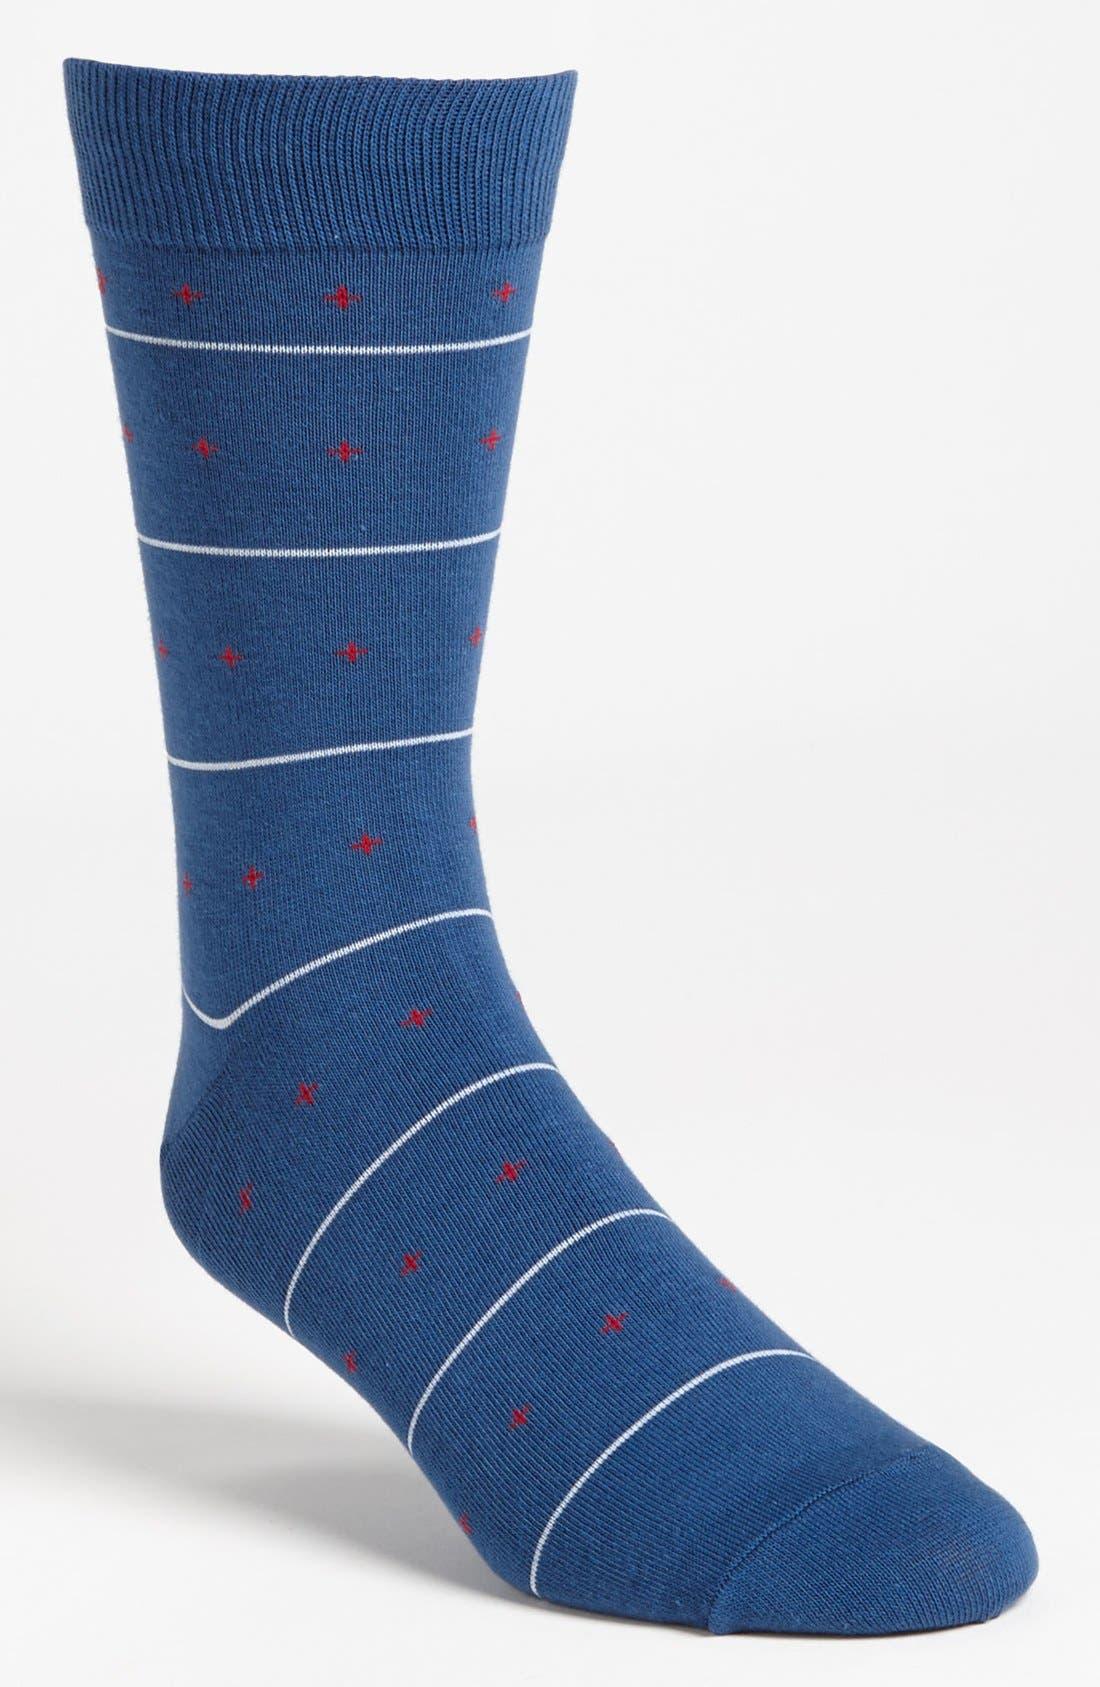 Alternate Image 1 Selected - Richer Poorer 'Tourist' Socks